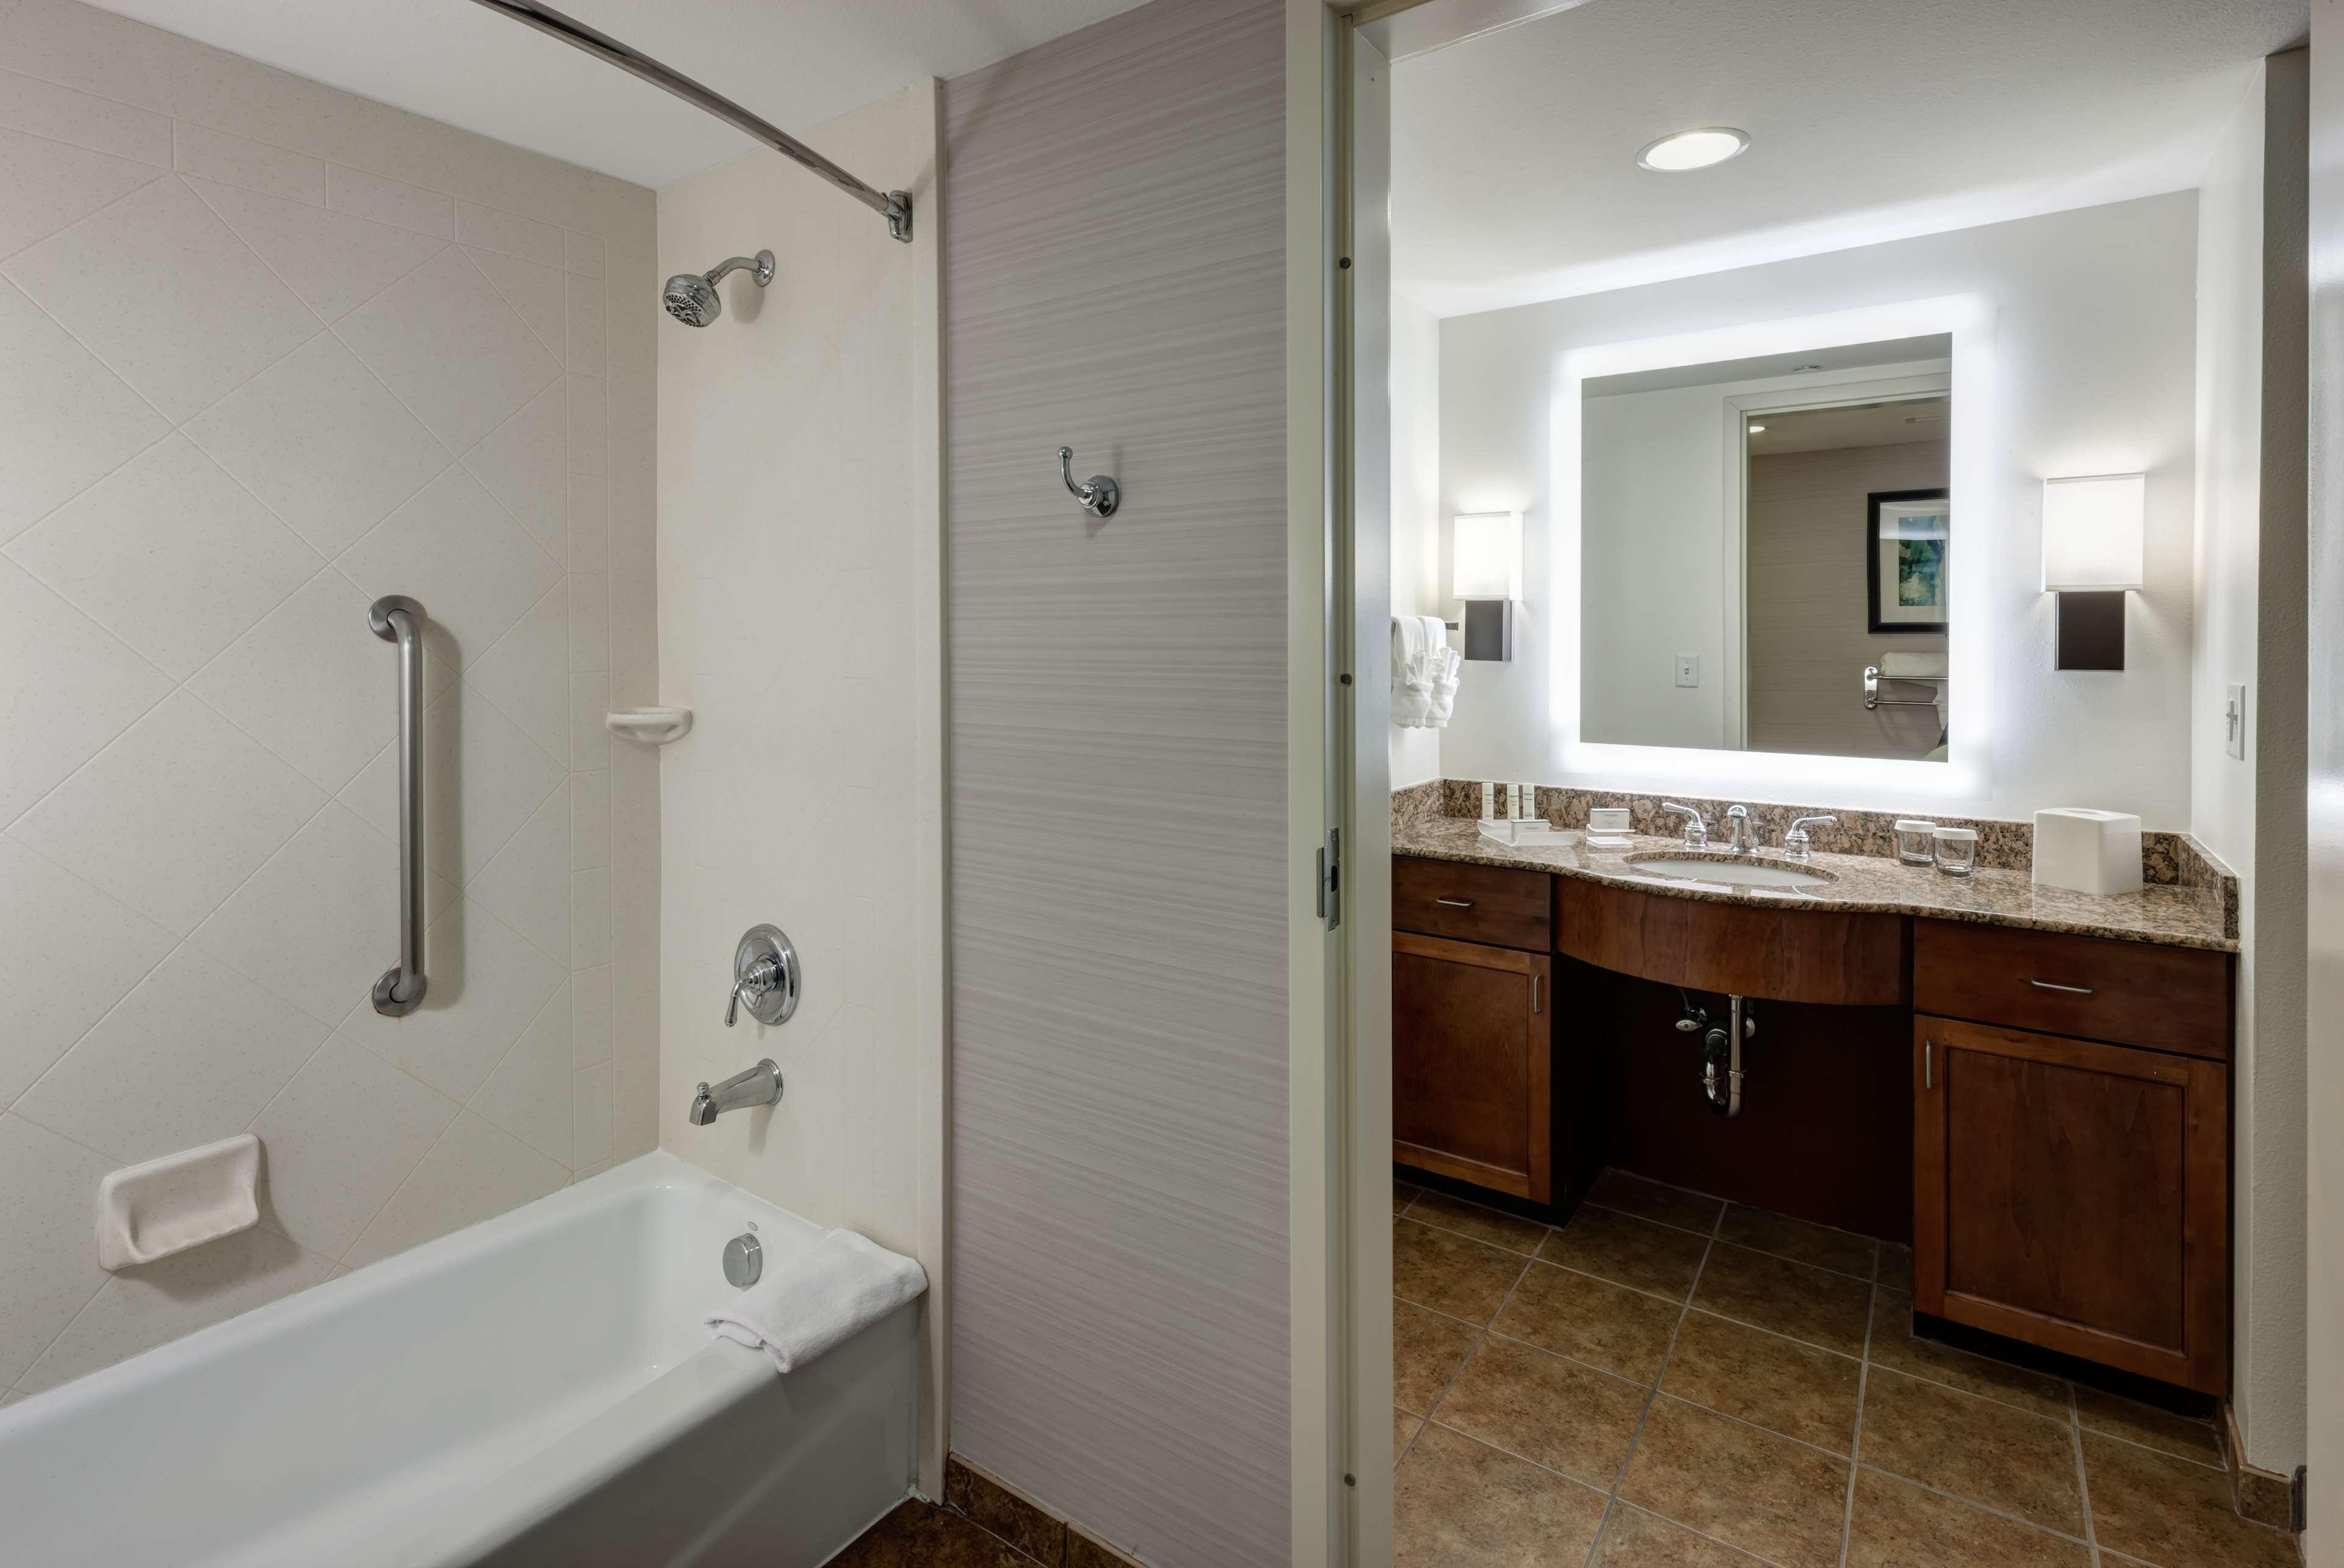 Homewood Suites by Hilton Denton image 20